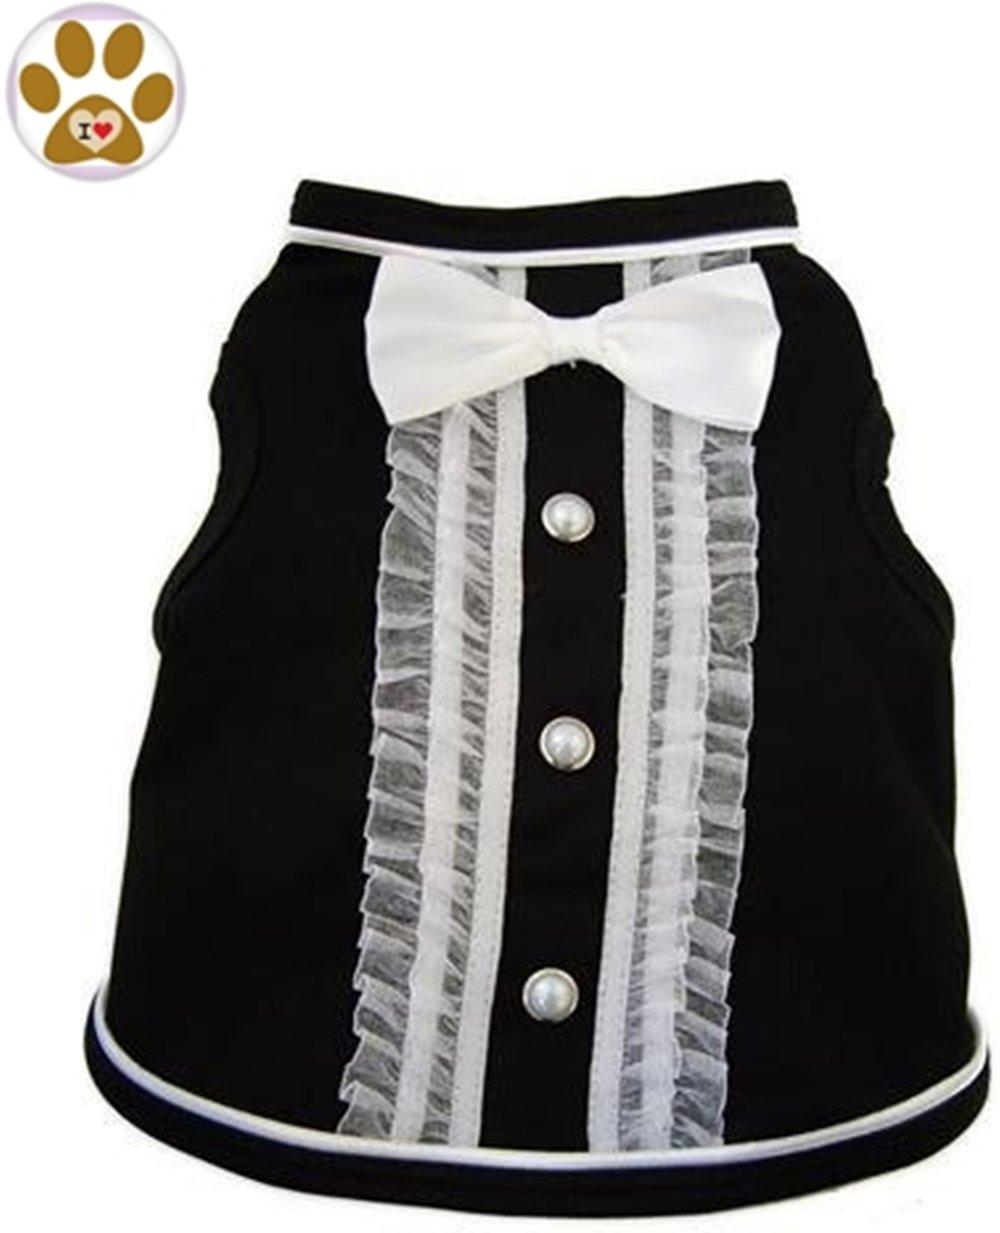 Black Ivory Medium Chest 16\ Black Ivory Medium Chest 16\ Black Formal Bow Tie Tuxedo Styled Tank T-Shirt and Pin for Dog Sizes XS thru 2XL (Medium Chest 16 -18, Neck 14 , Black Ivory)